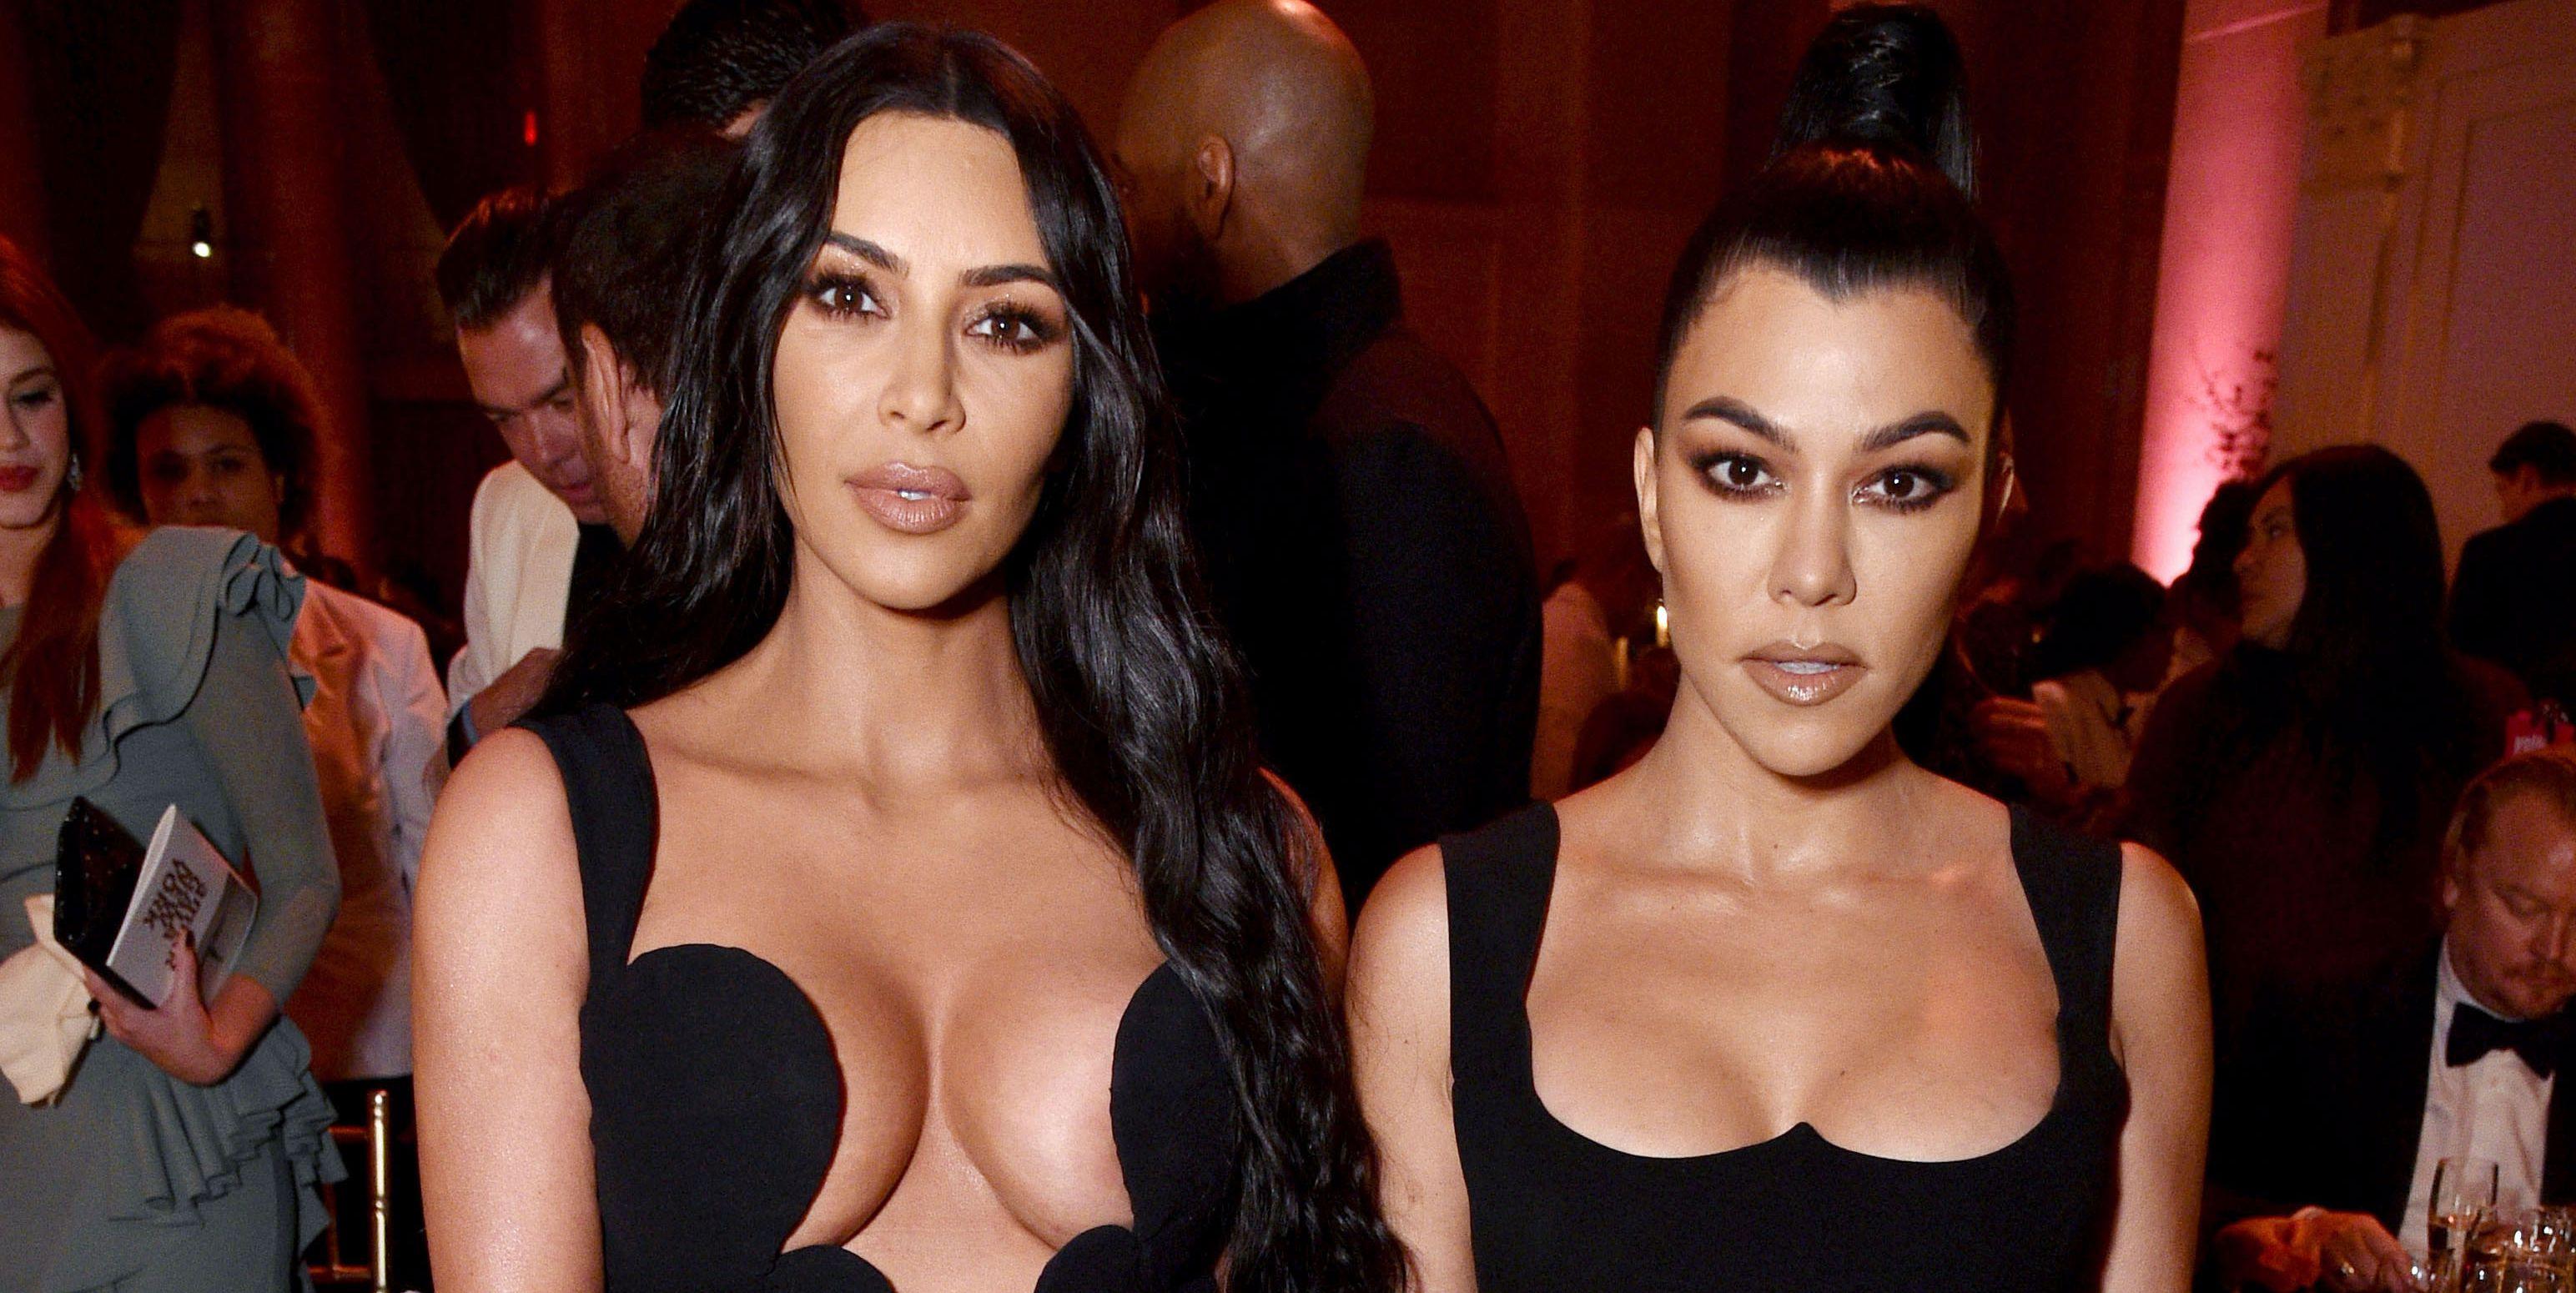 Kim And Kourtney Kardashian Schooled Us In Daring Necklines At The AmfAR Gala Last Night